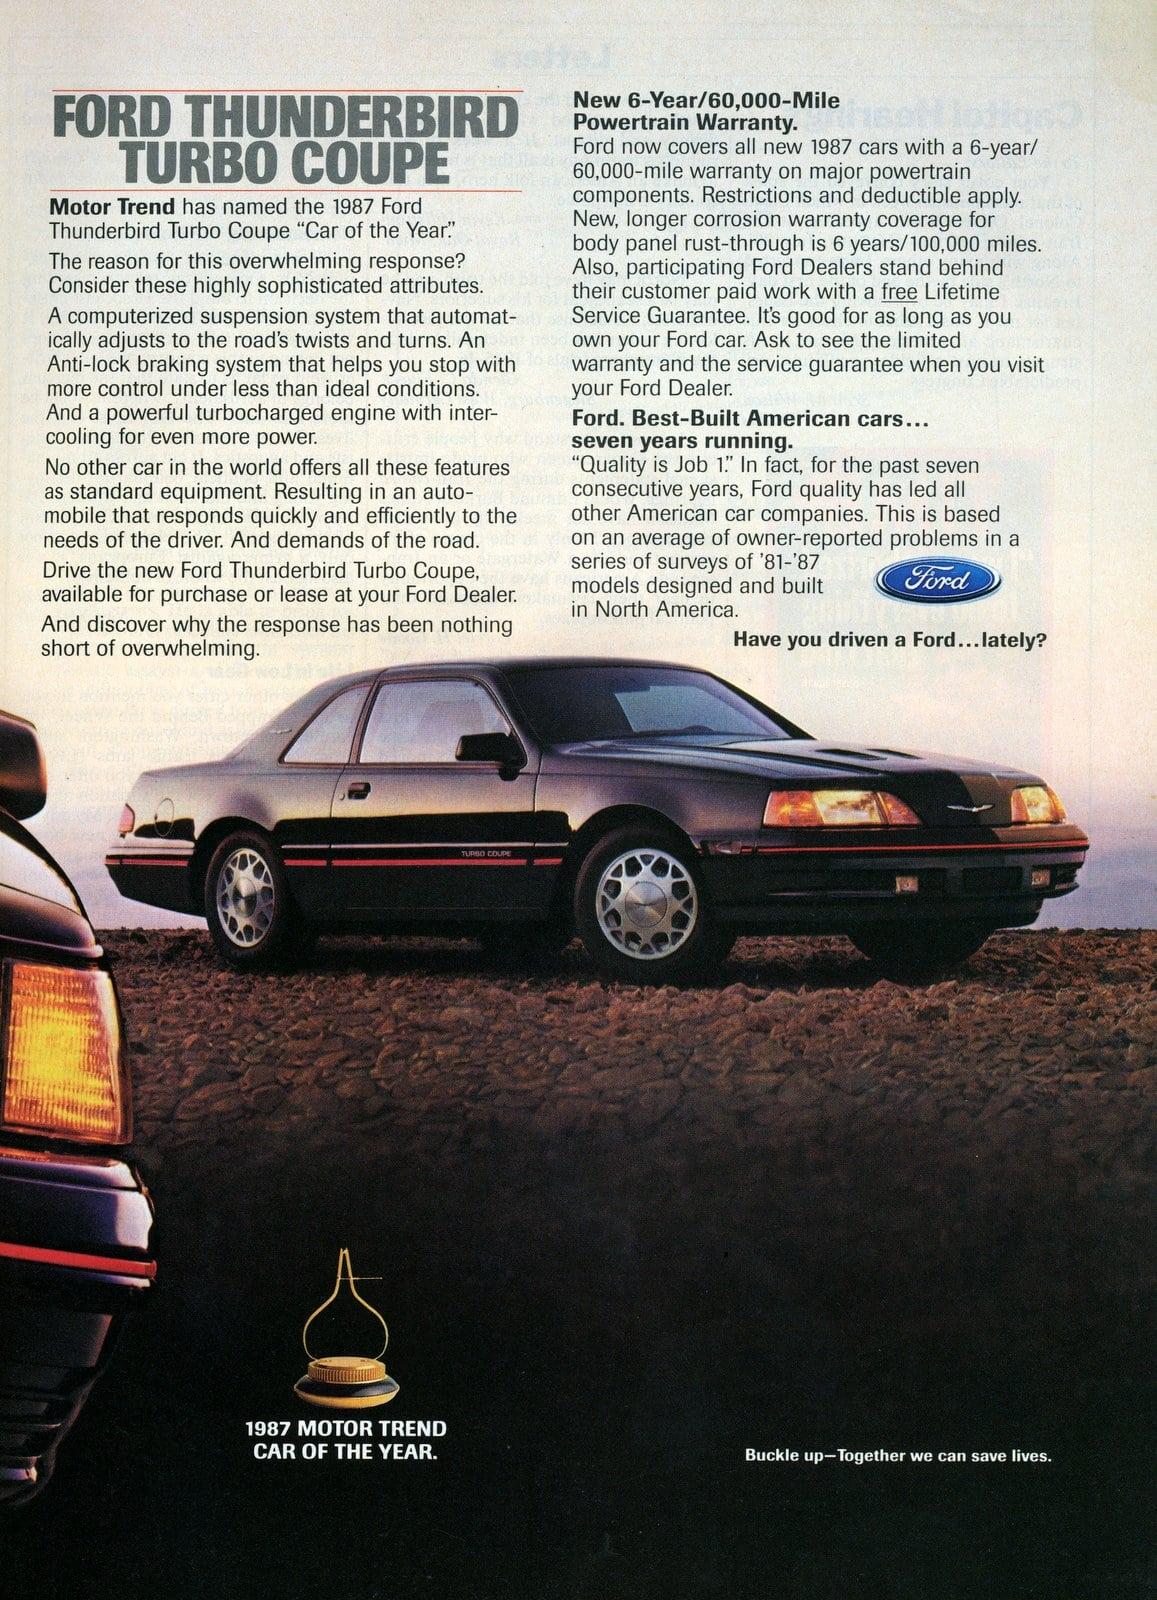 Vintage Ford Thunderbird cars - 1987 (1)